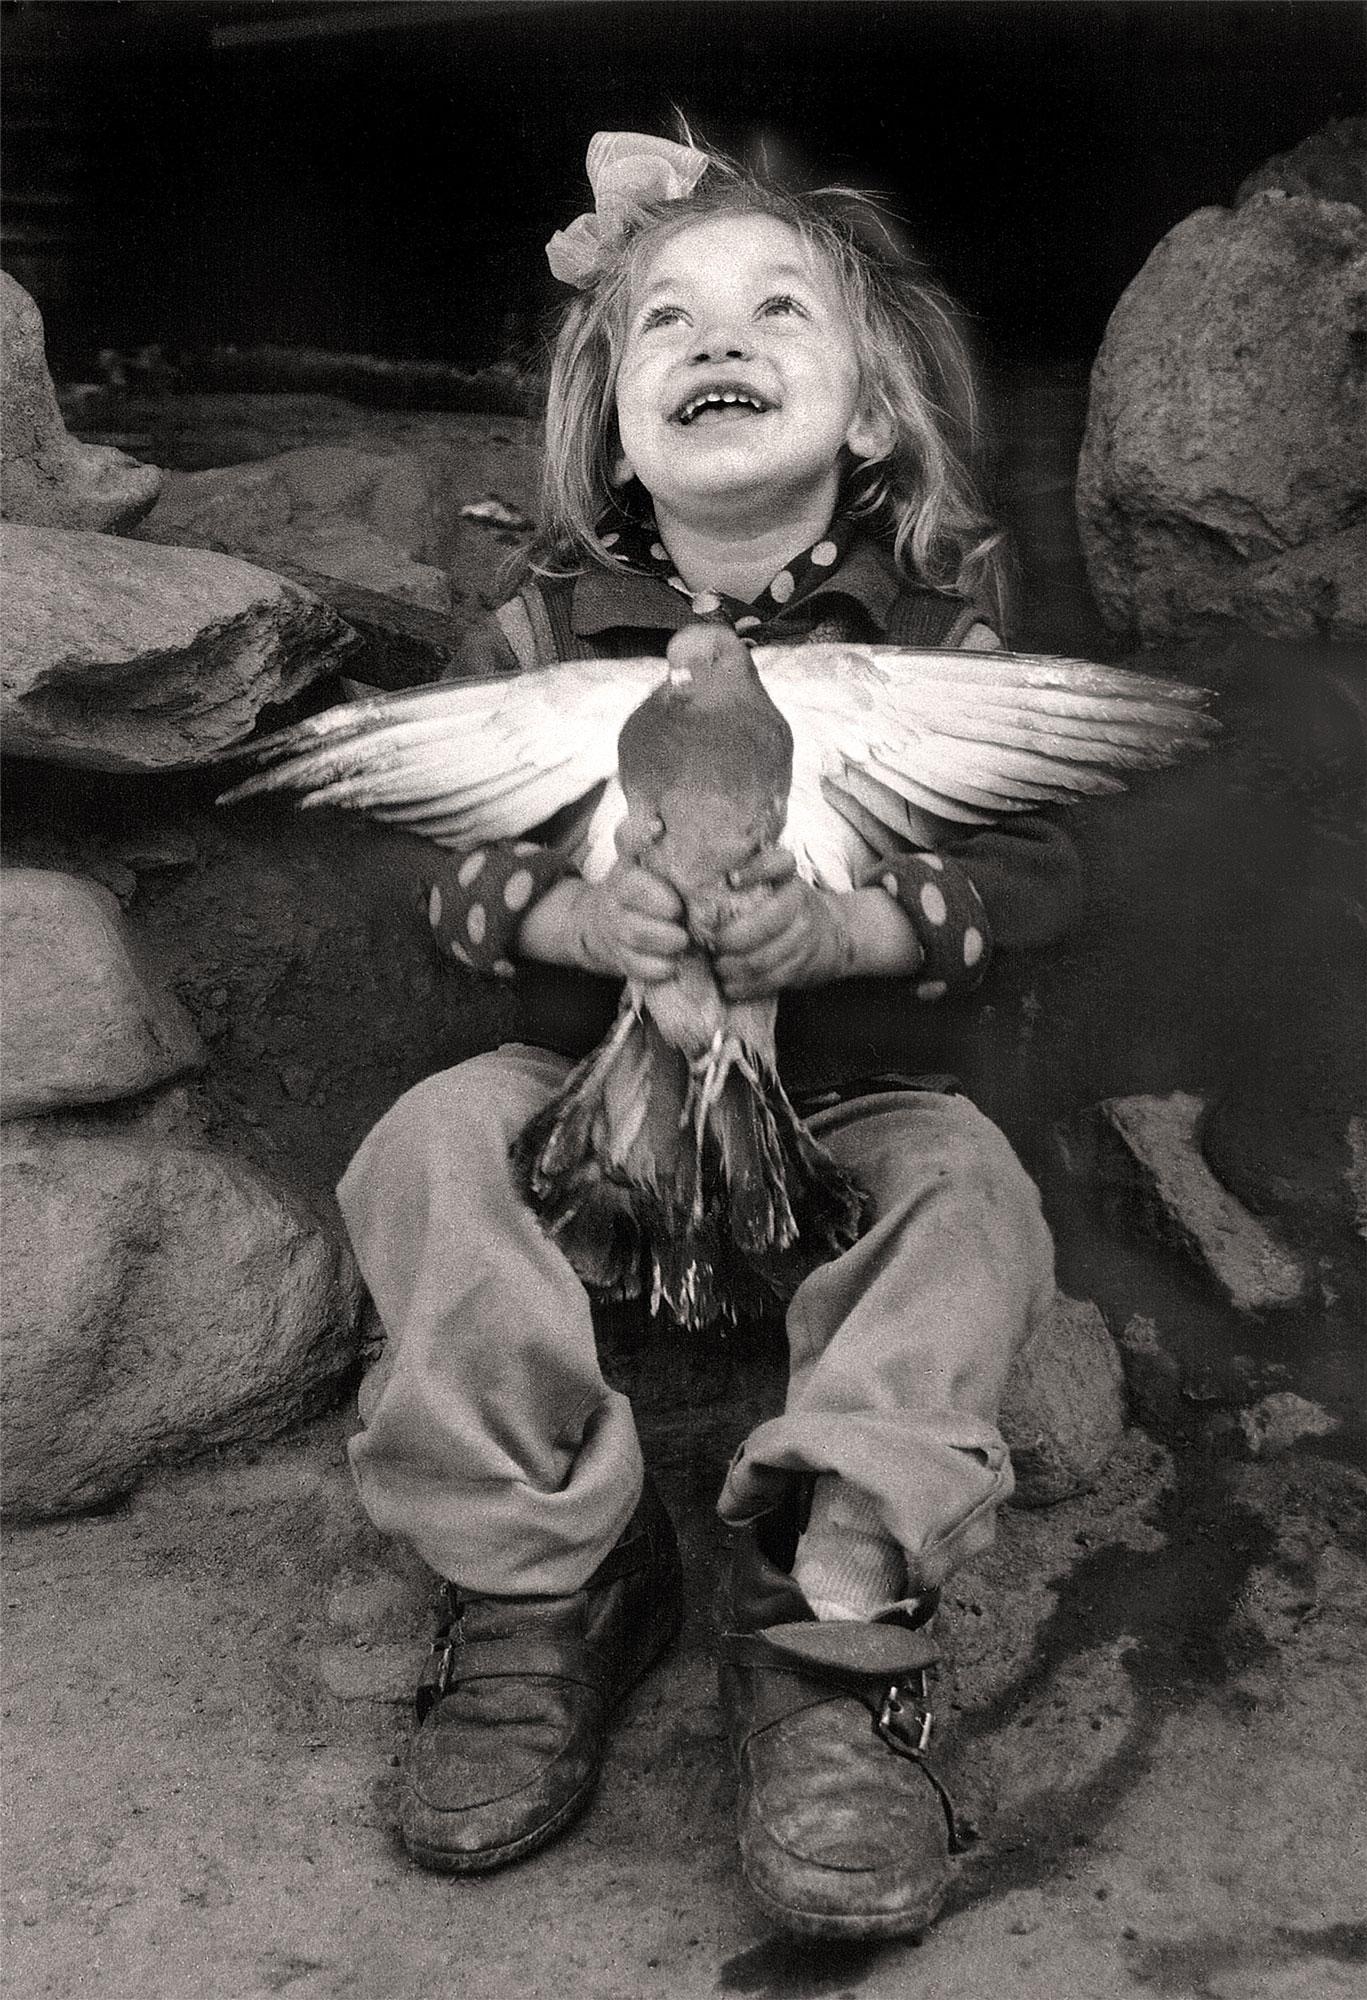 The Girl With The Dove | Jacko Vassilev – The Joy of Freedom | Luz Art Los Angeles, CA